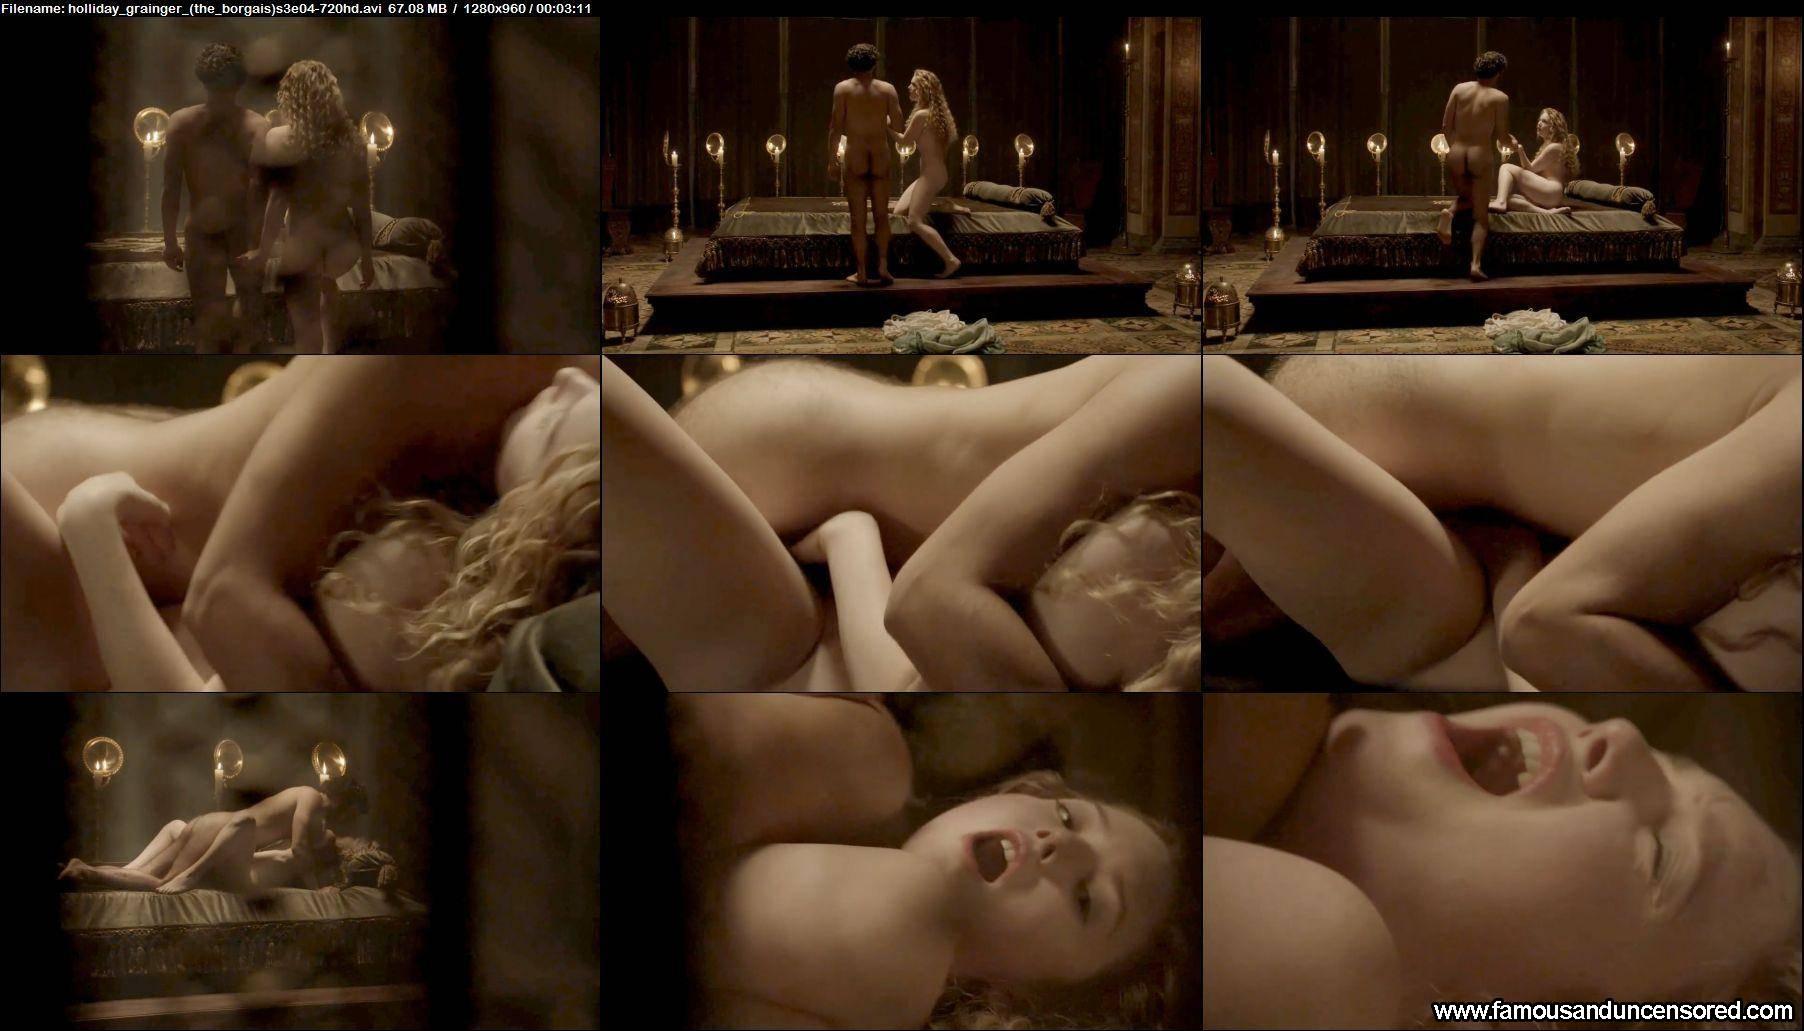 Grainger pics holliday nude